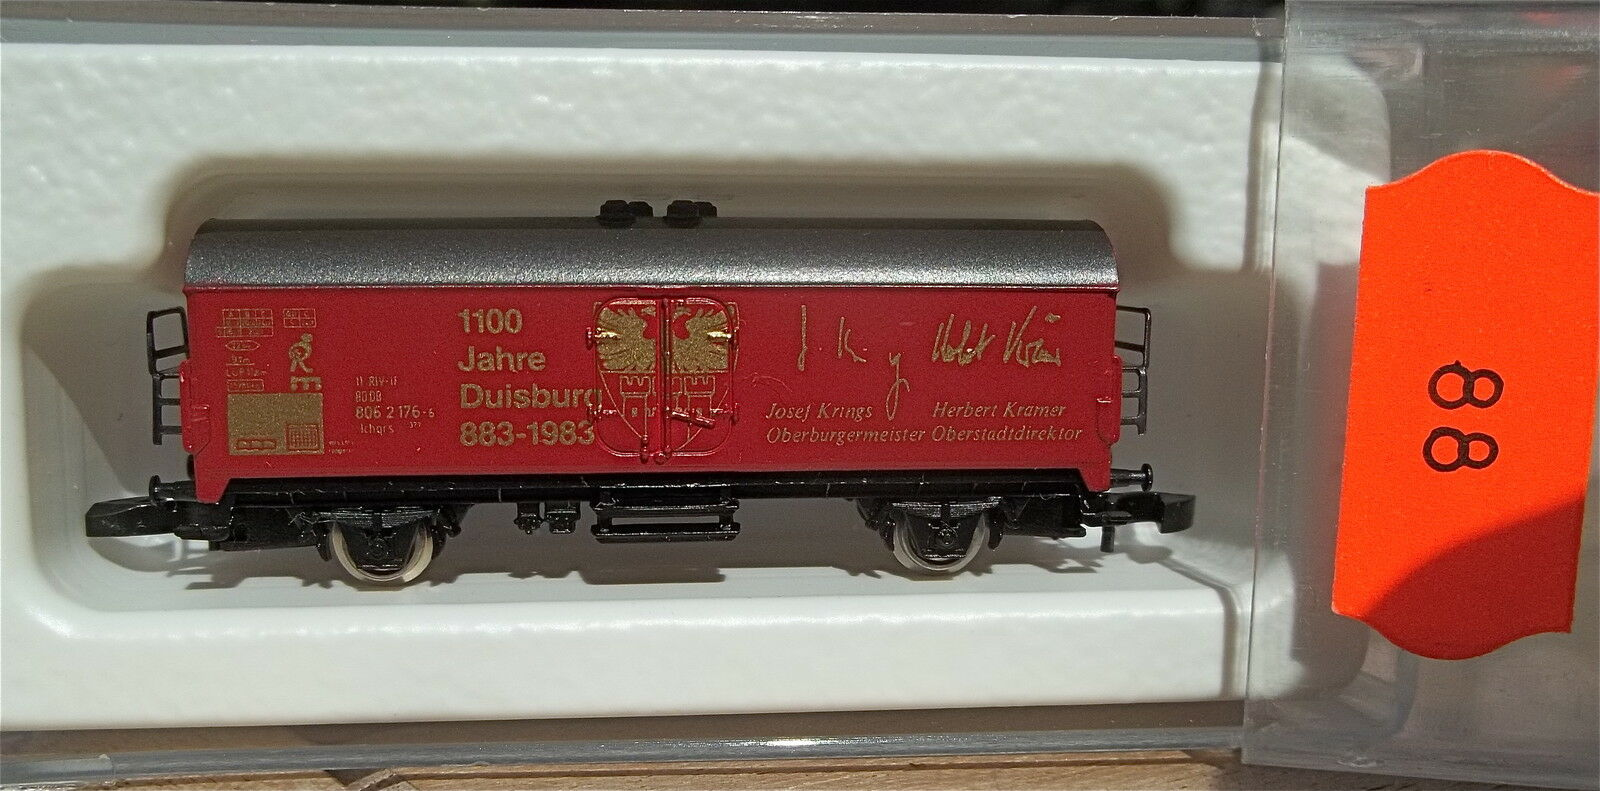 1100 J.Duisburg 883-1983, Kolls 86701 Märklin 8600 Voie Z 1 220 88